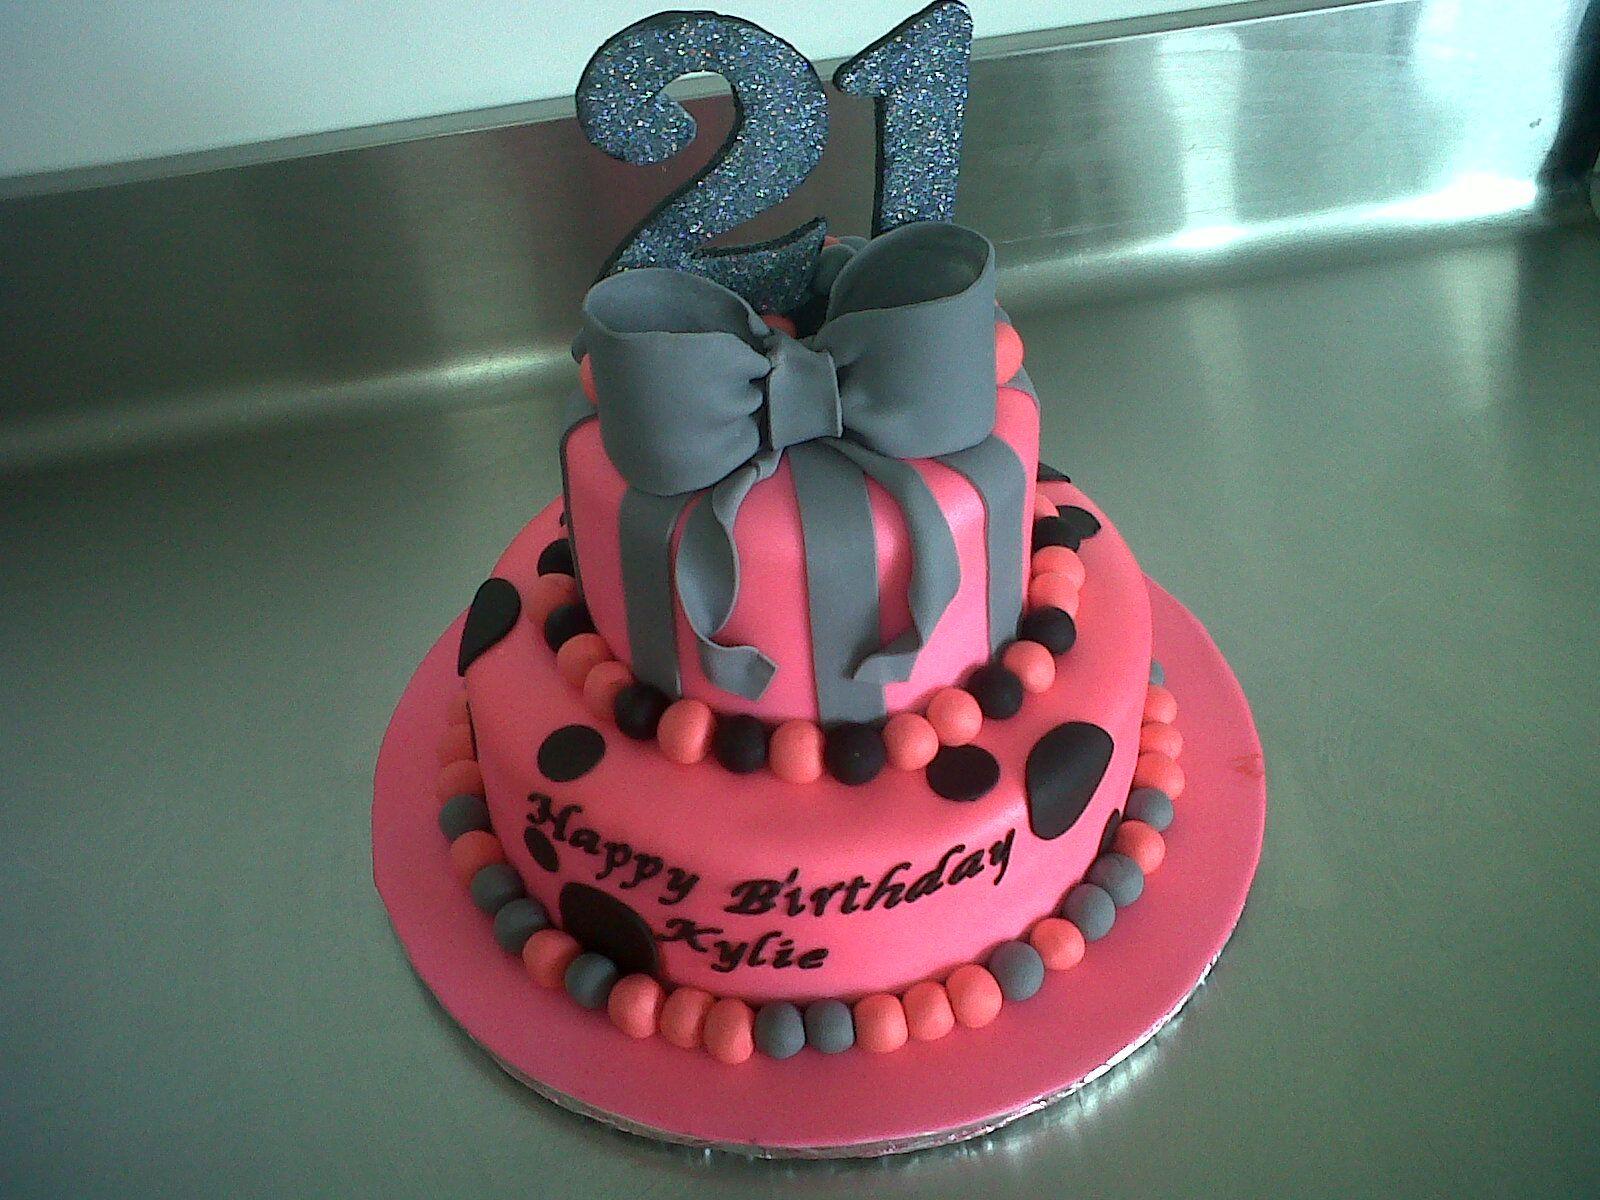 334 best Novelty Cake Ideas images on Pinterest Fondant cakes Novelty birthday cake pictures